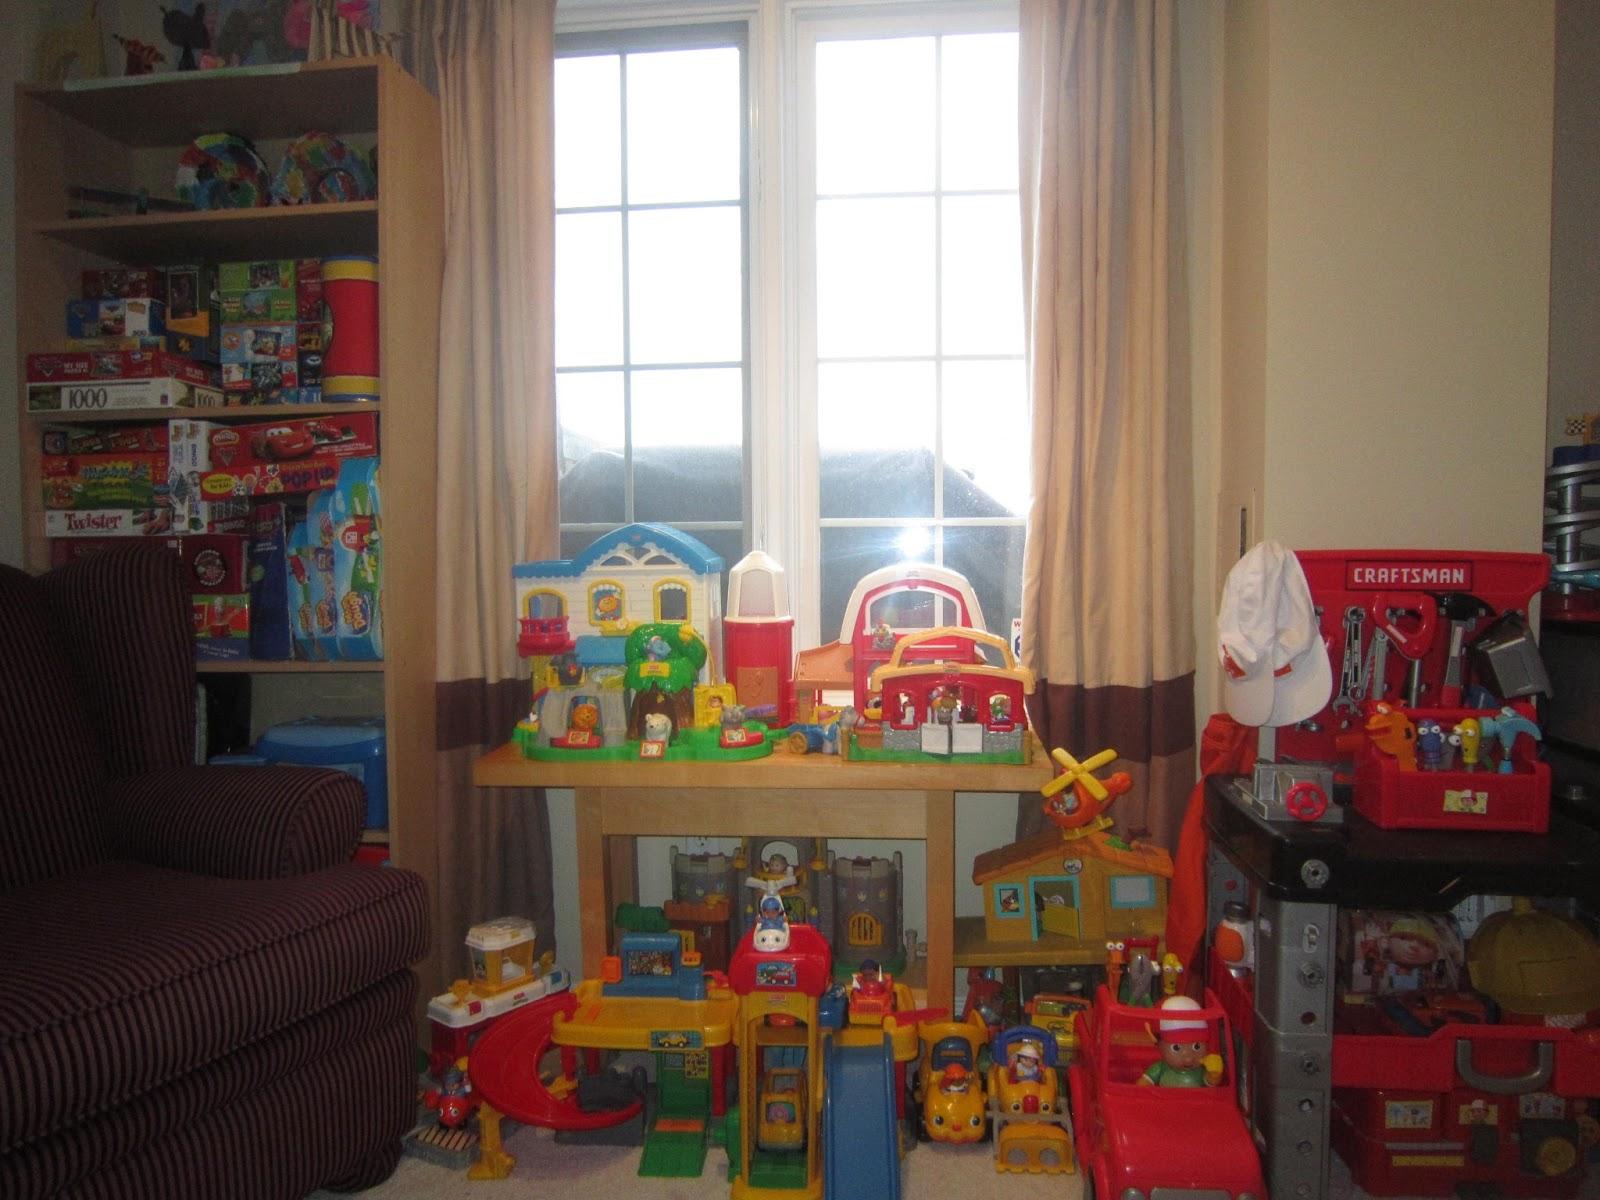 Home decor, playroom organization, toy organization, brown drapes